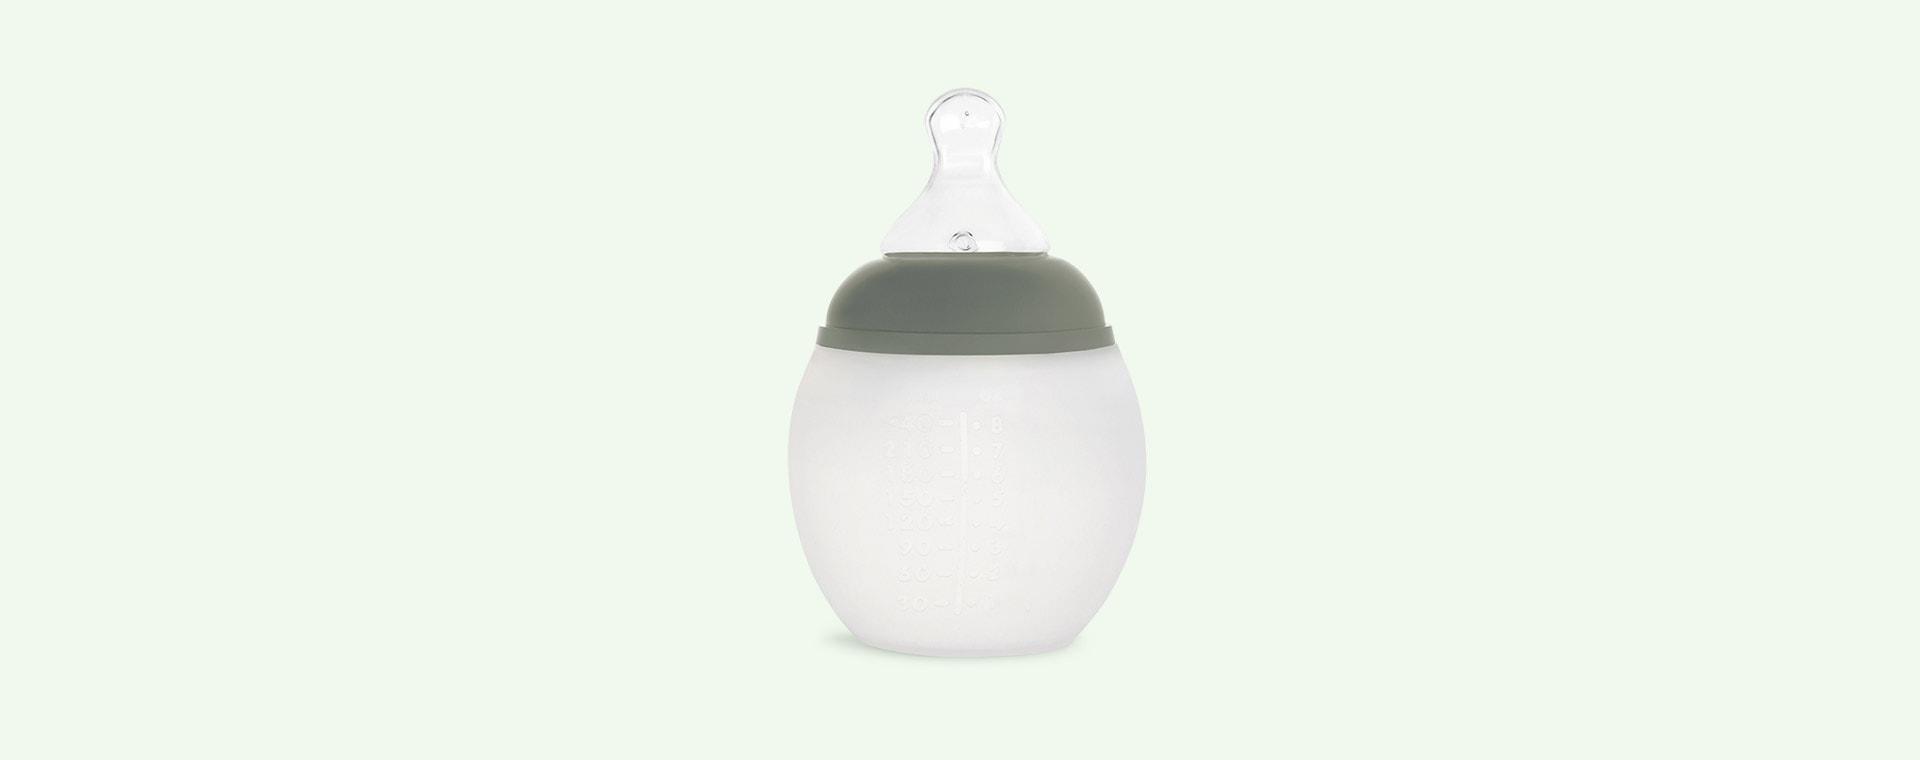 Kaki Elhee Baby Bottle